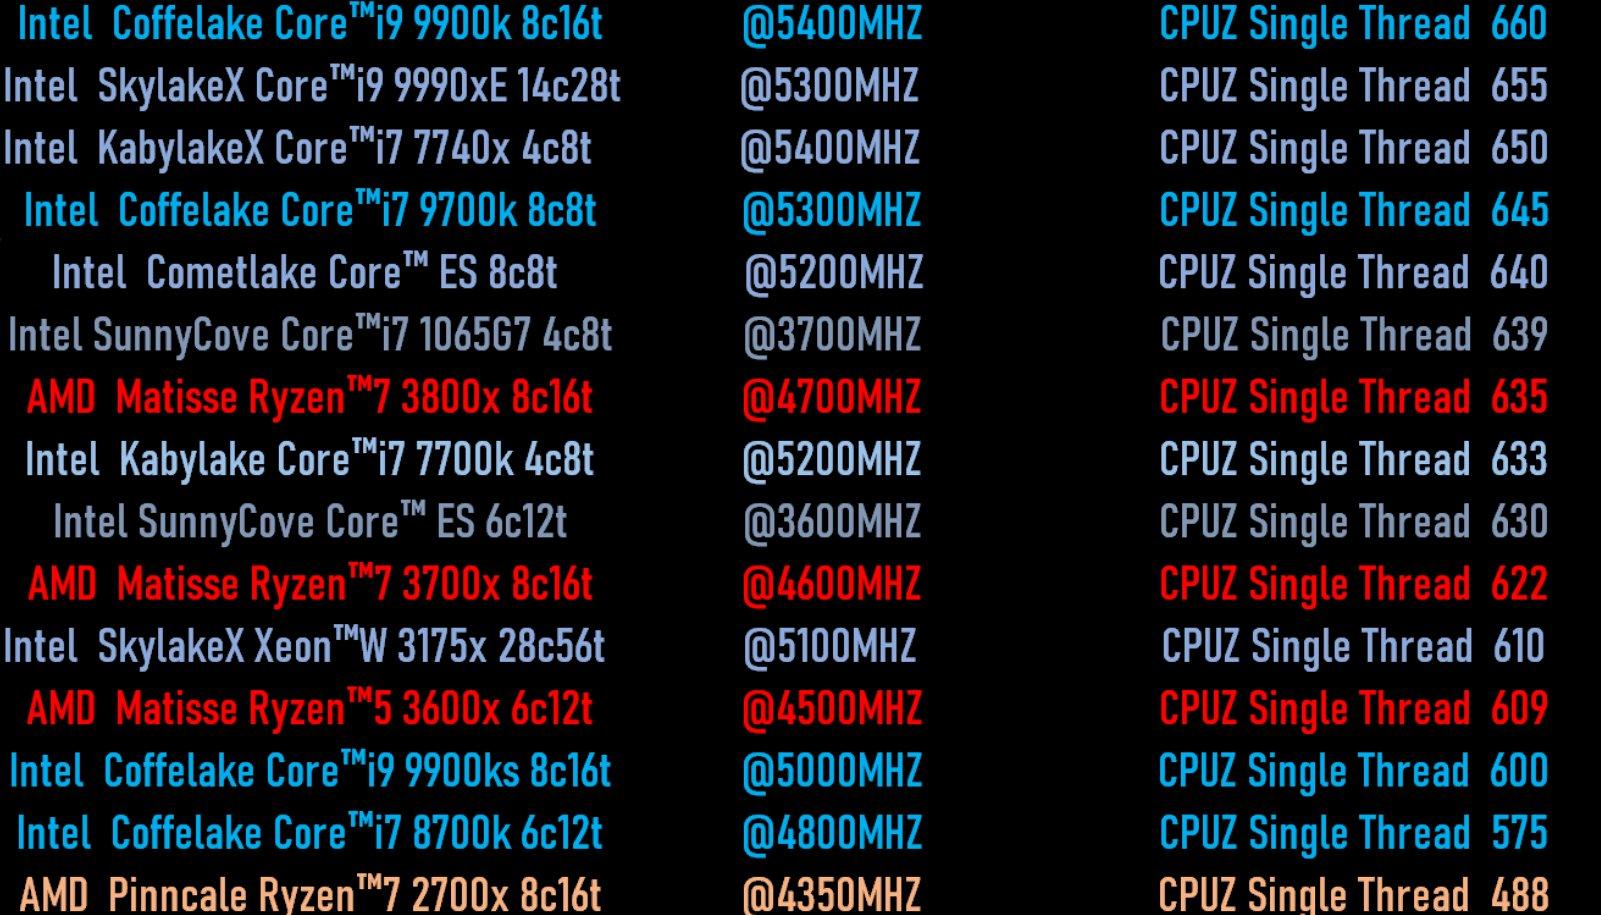 https://cdn.wccftech.com/wp-content/uploads/2019/06/Intel-Sunny-Cove-10nm-Ice-Lake-ES-CPU-Comet-Lake-CPU-AMD-Ryzen-3000-CPU-Single-Core-Performance-Benchmark-Leak.jpg